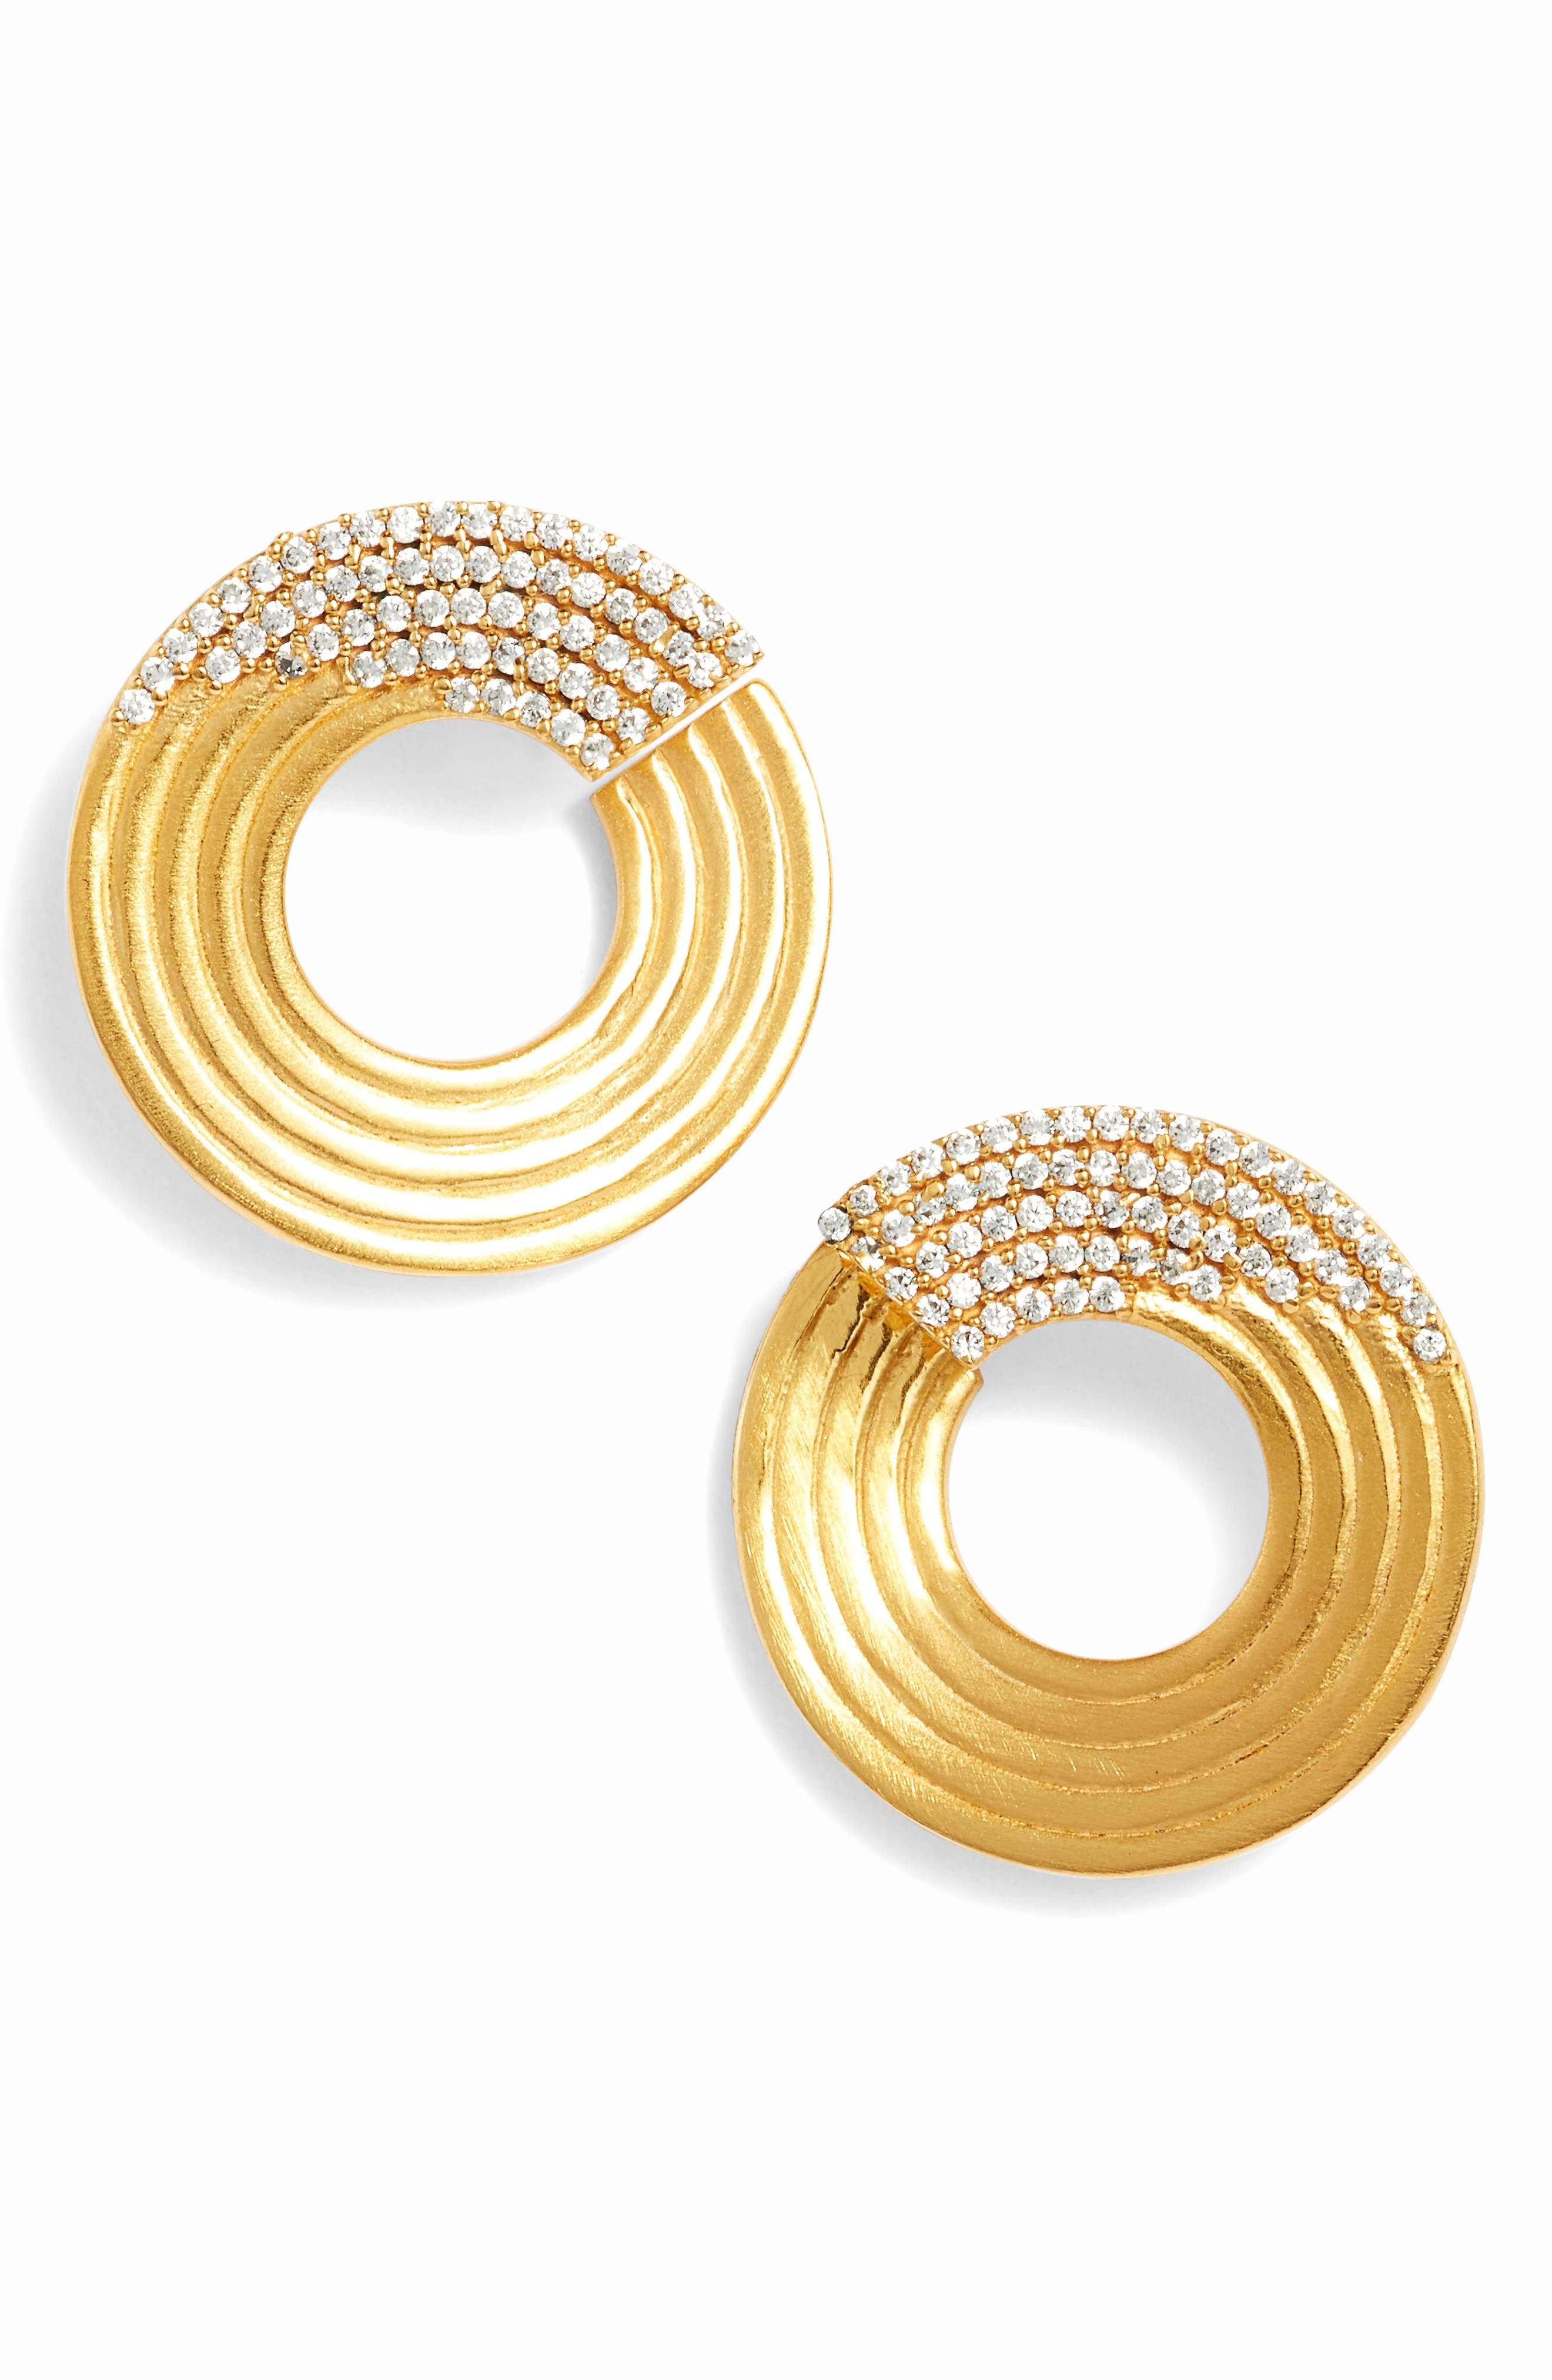 Zaha Stud Earrings,                         Main,                         color, White Topaz/ Gold